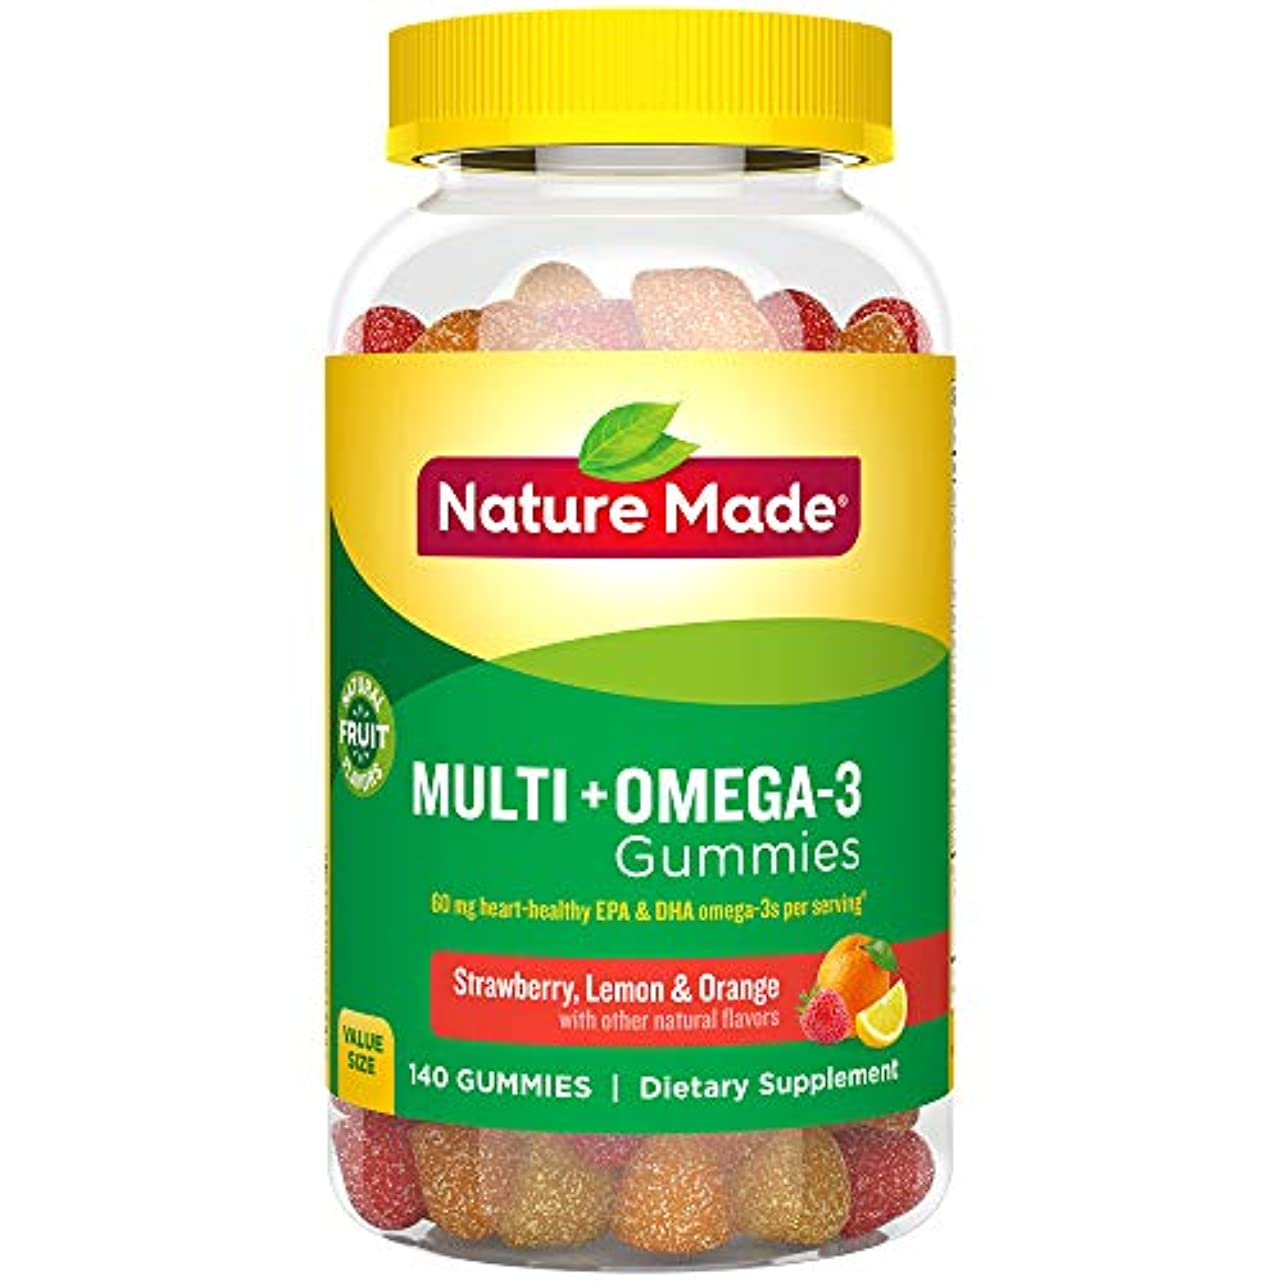 Nature Made Multi + Omega-3 Adult Gummies (60 mg of DHA & EPA per serving),140粒